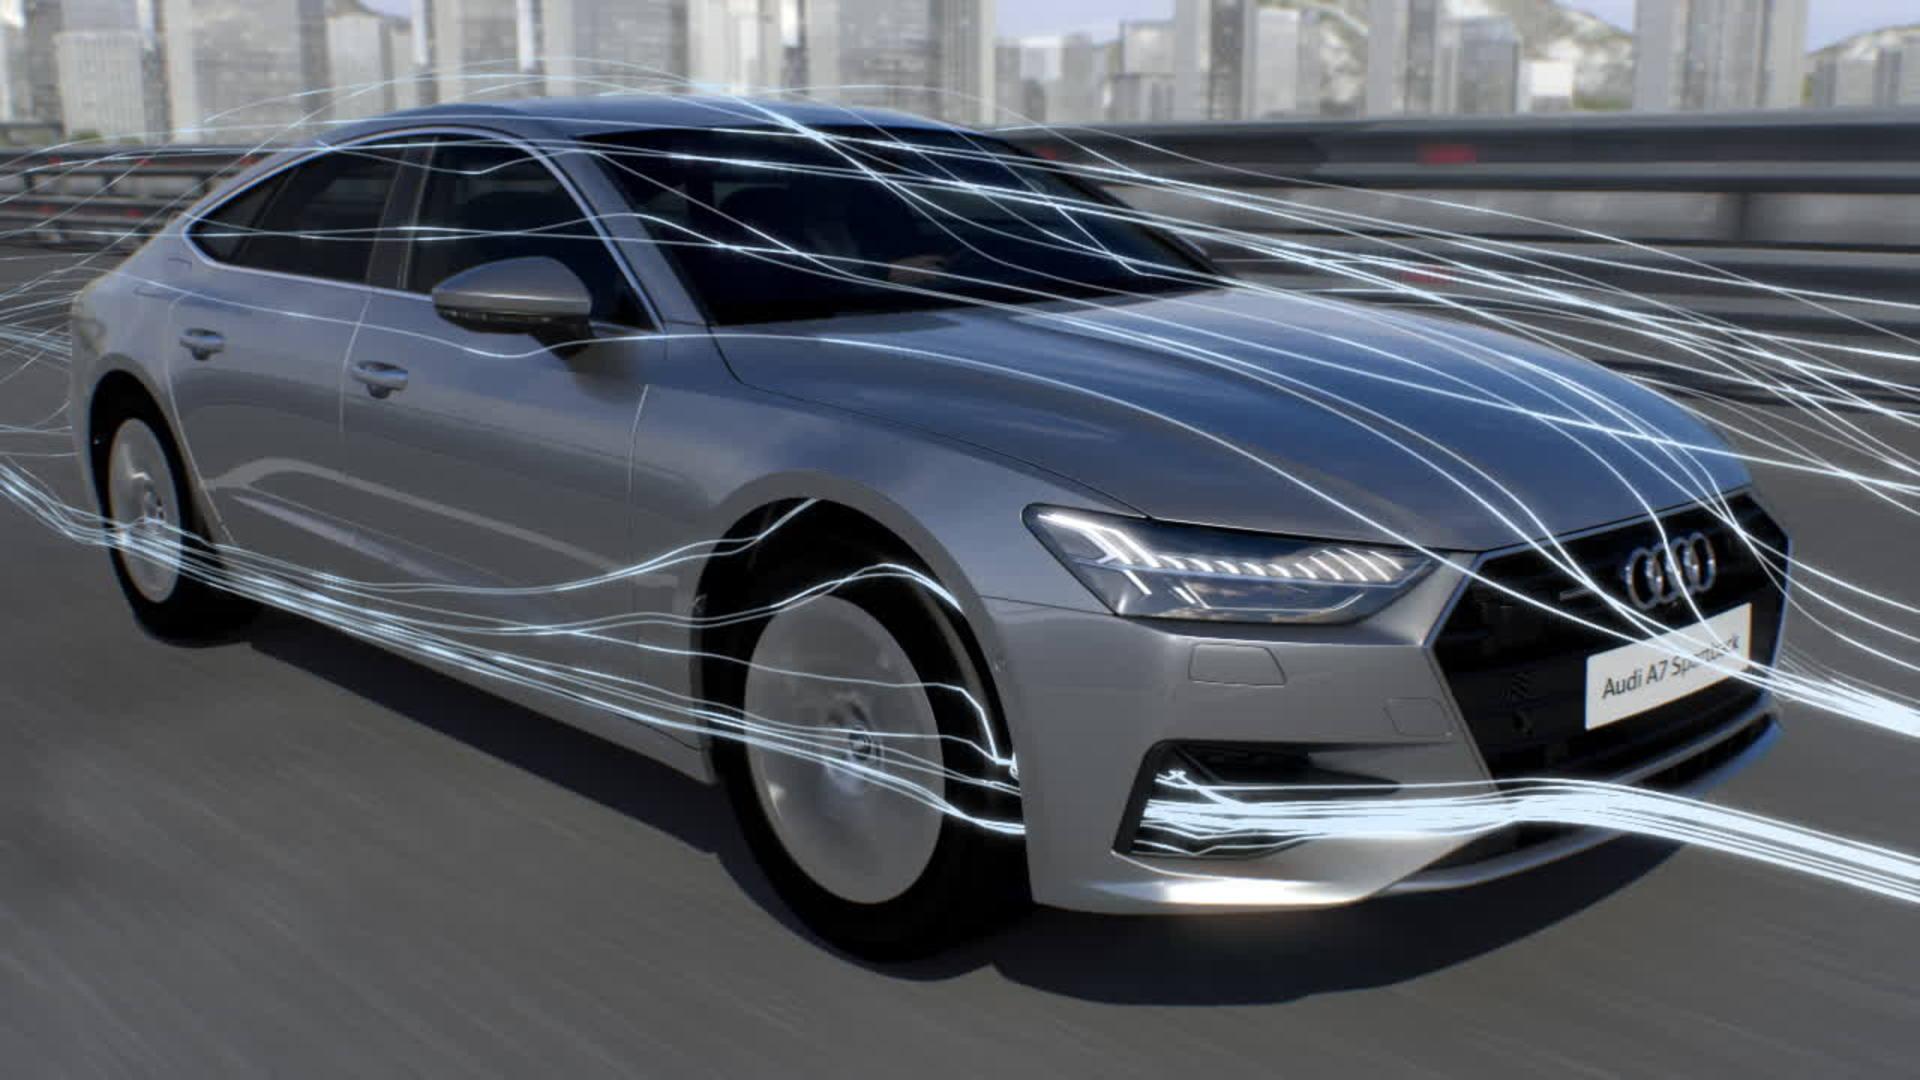 Audi A7 Animation Aerodynamik